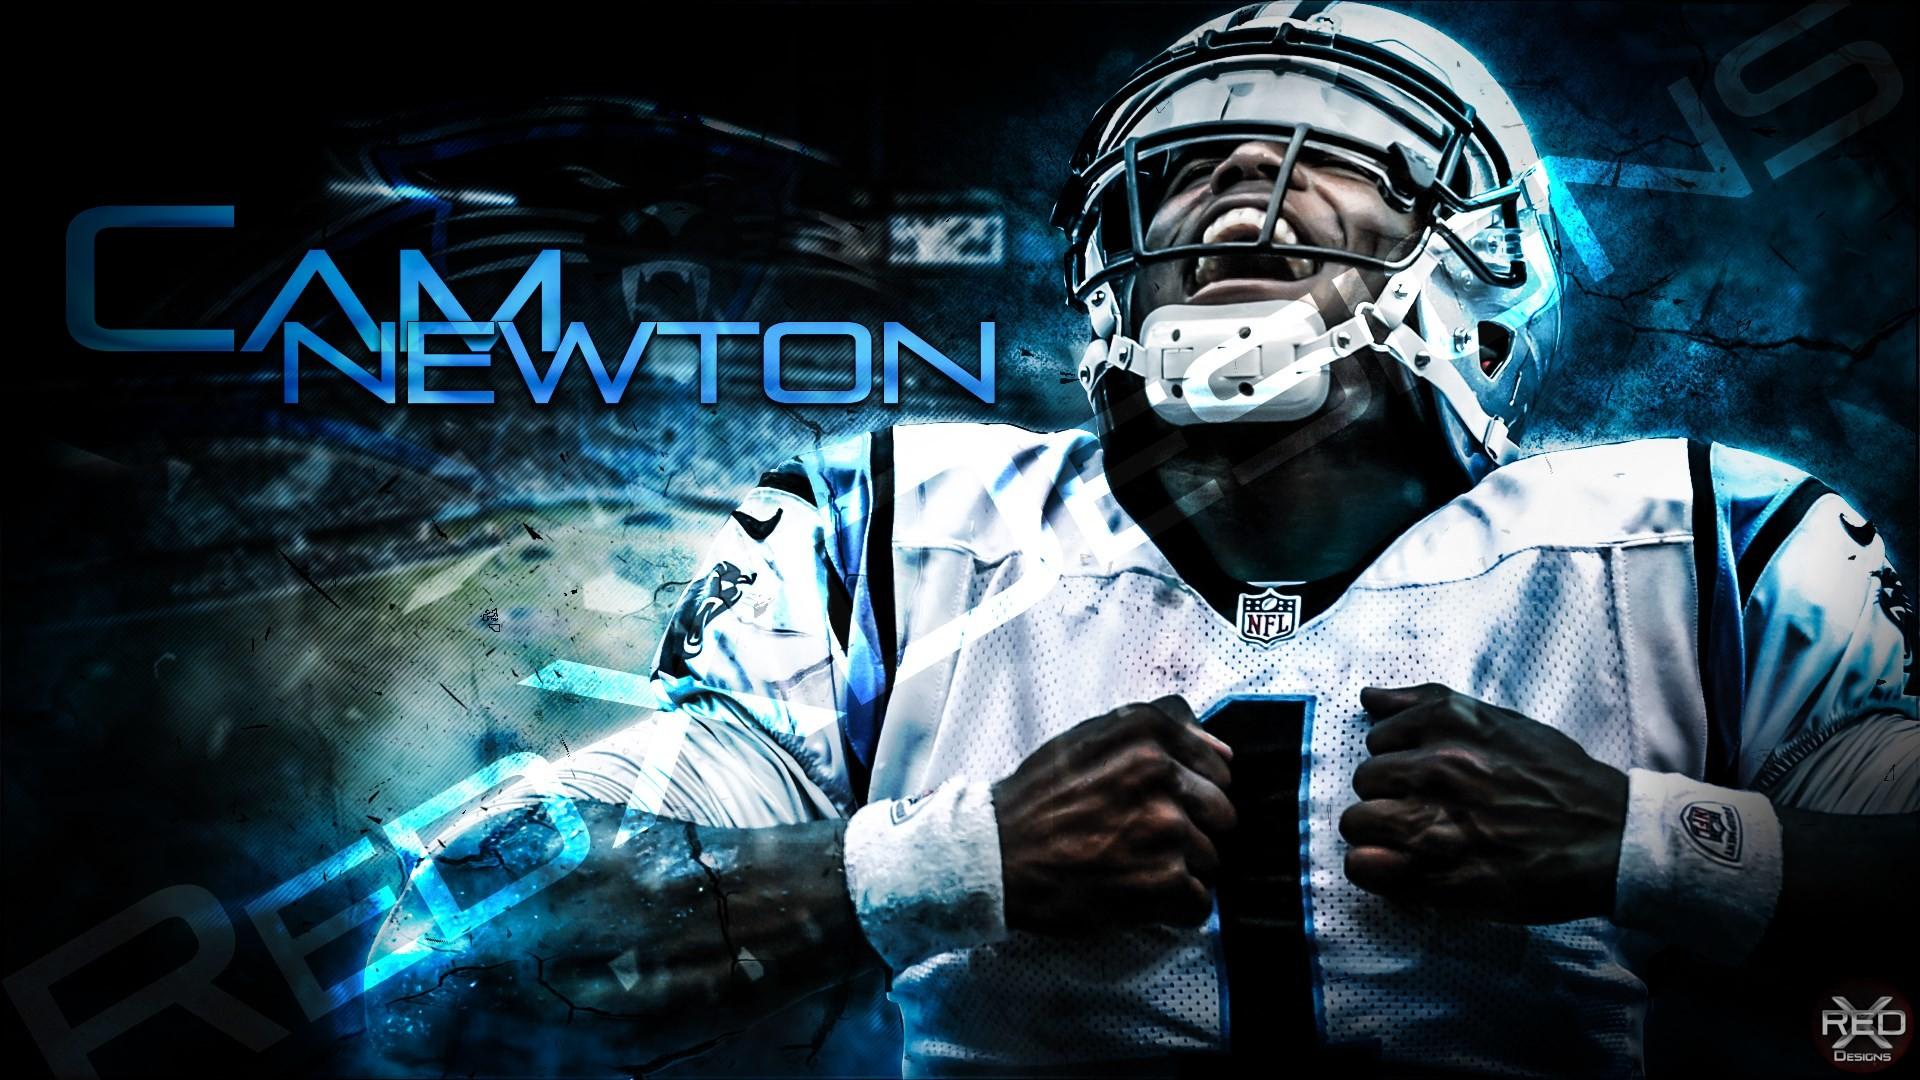 Free cam newton